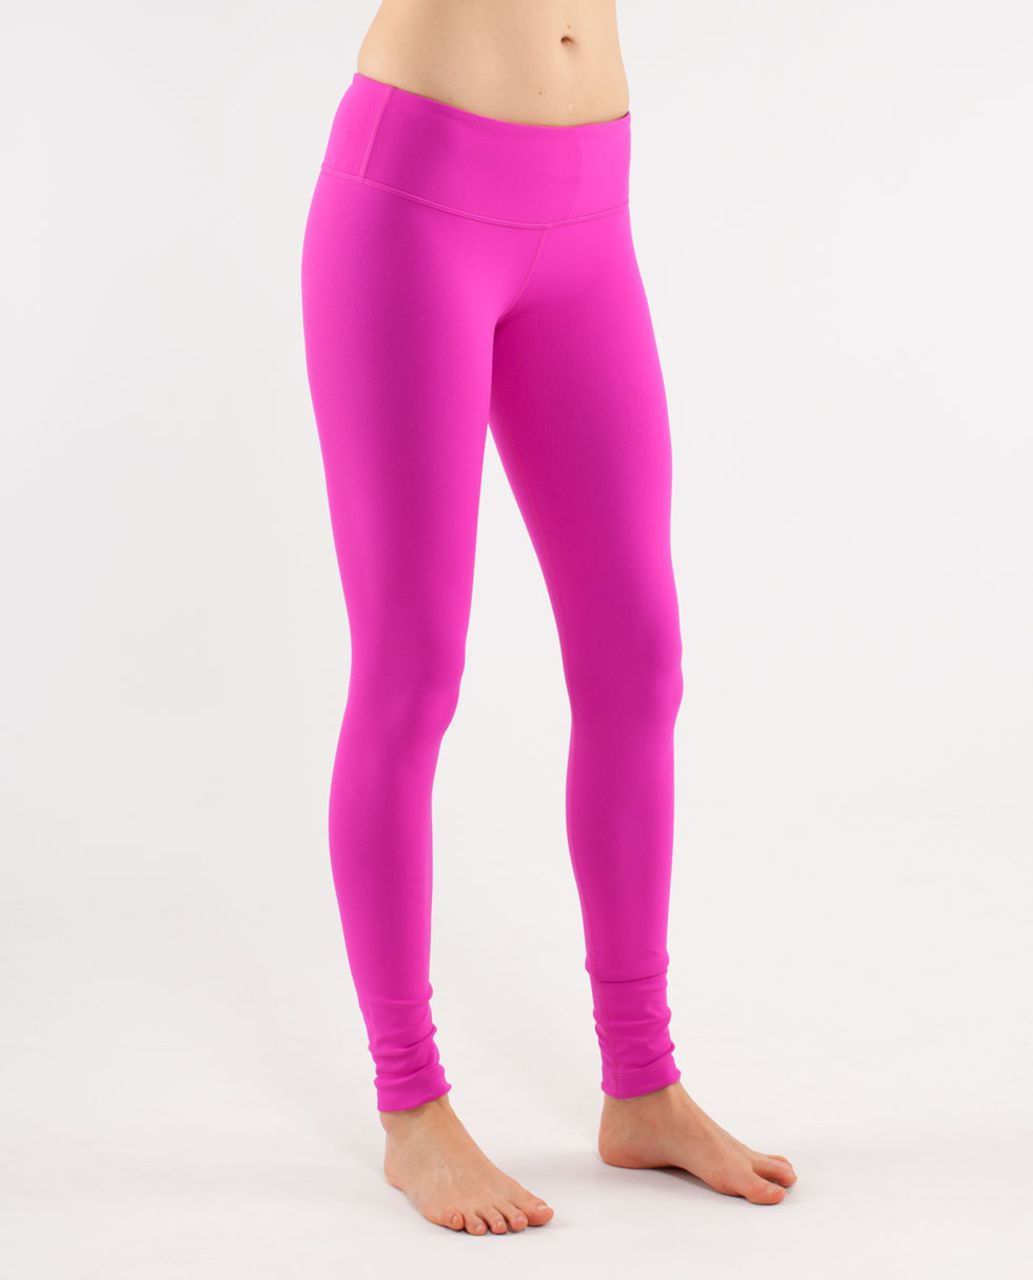 Lululemon Wunder Under Pant *Reversible - Black /  Paris Pink